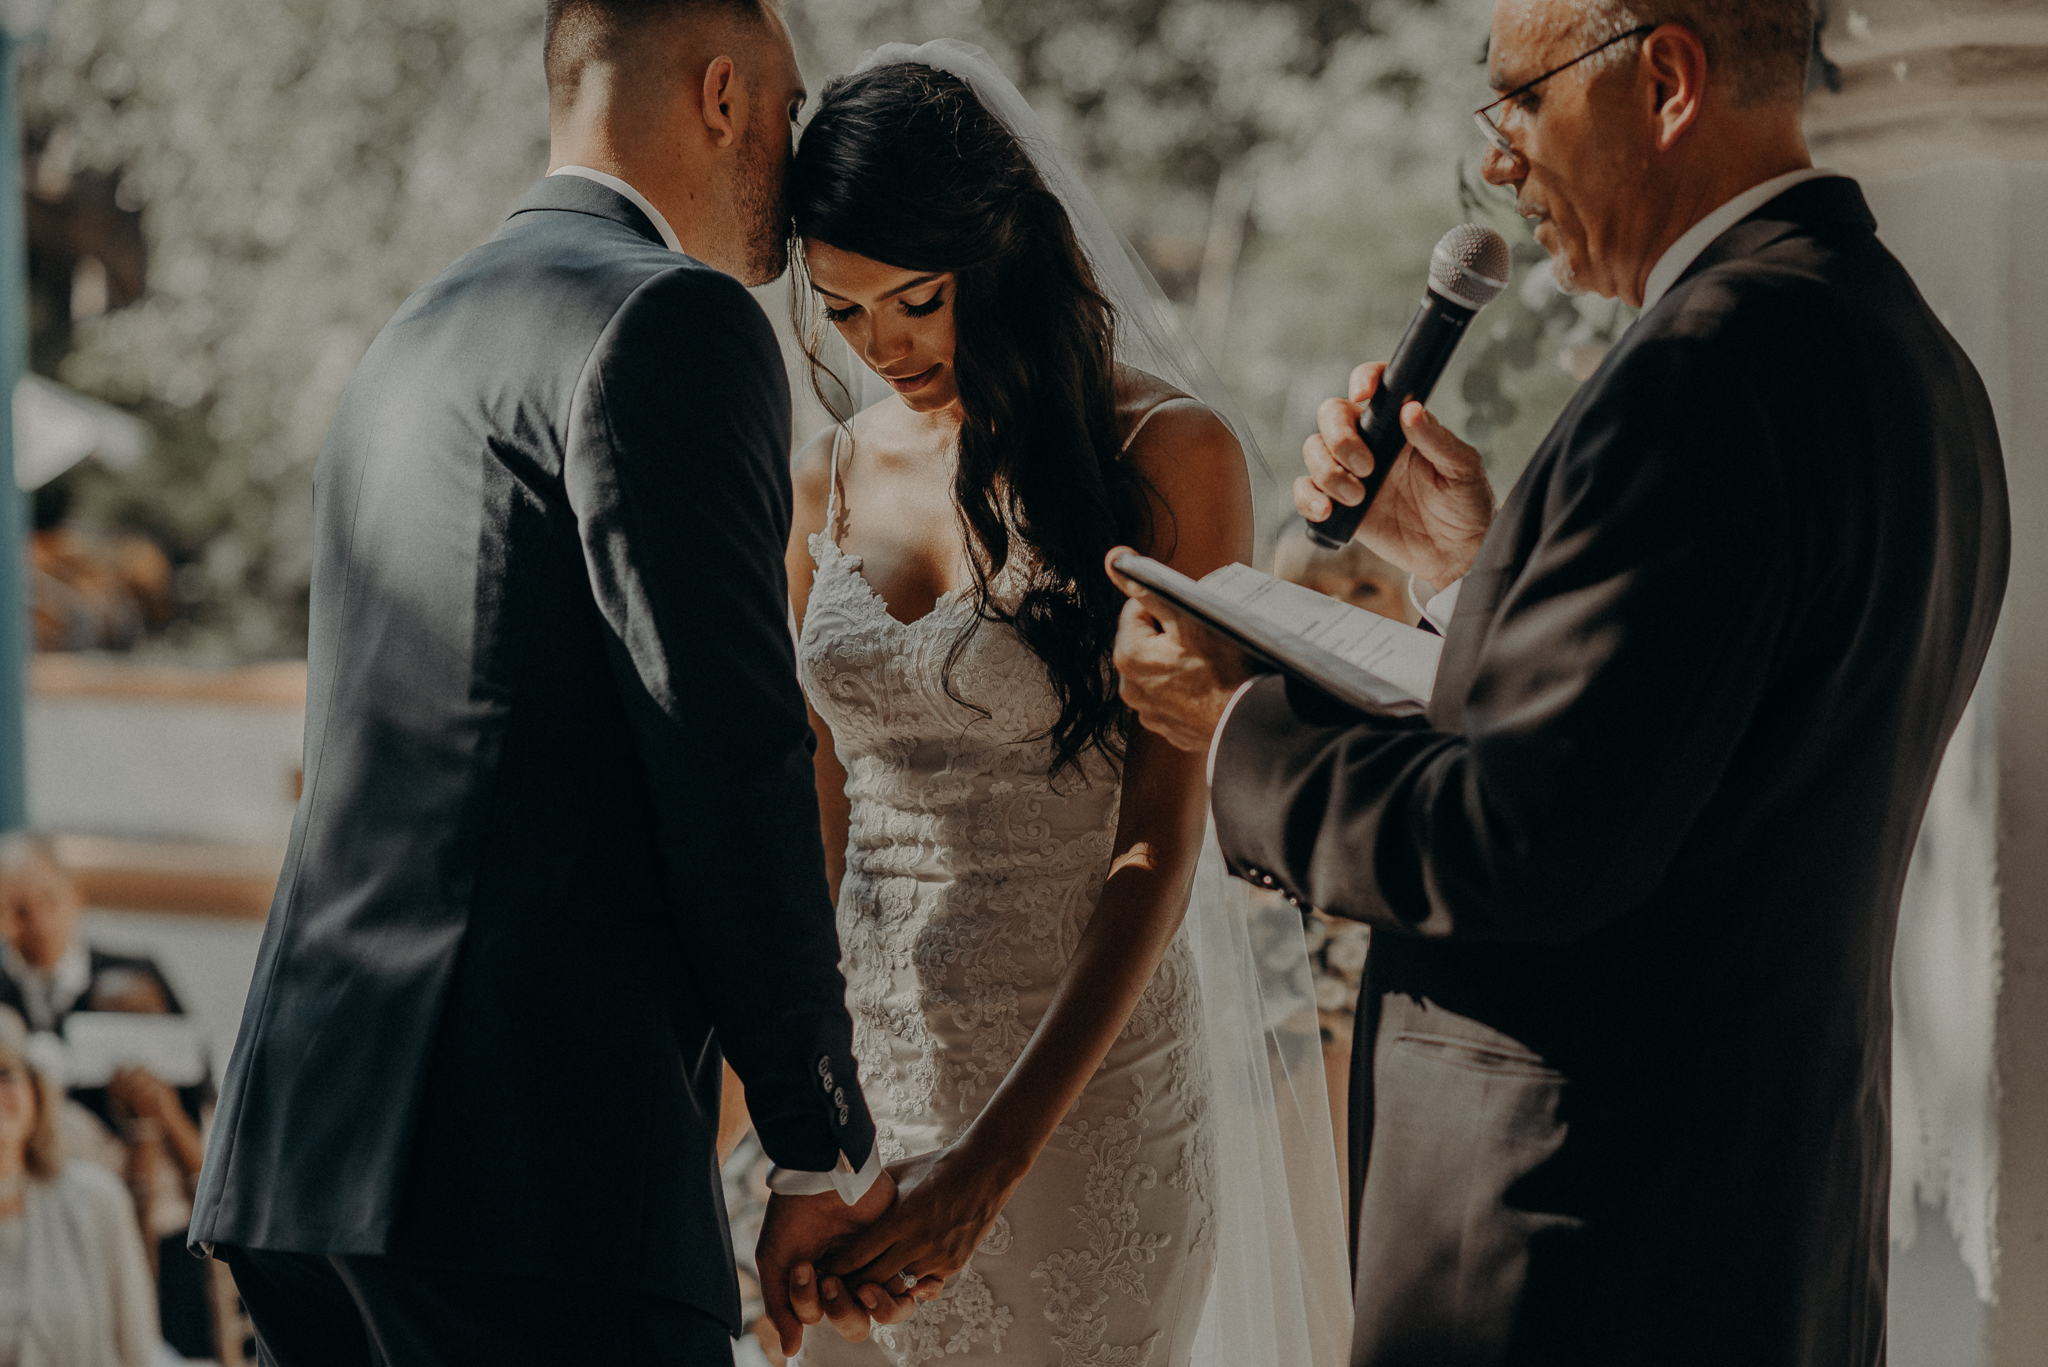 Isaiah + Taylor Photography - Rancho Las Lomas Wedding, Los Angeles Wedding Photographer-059.jpg